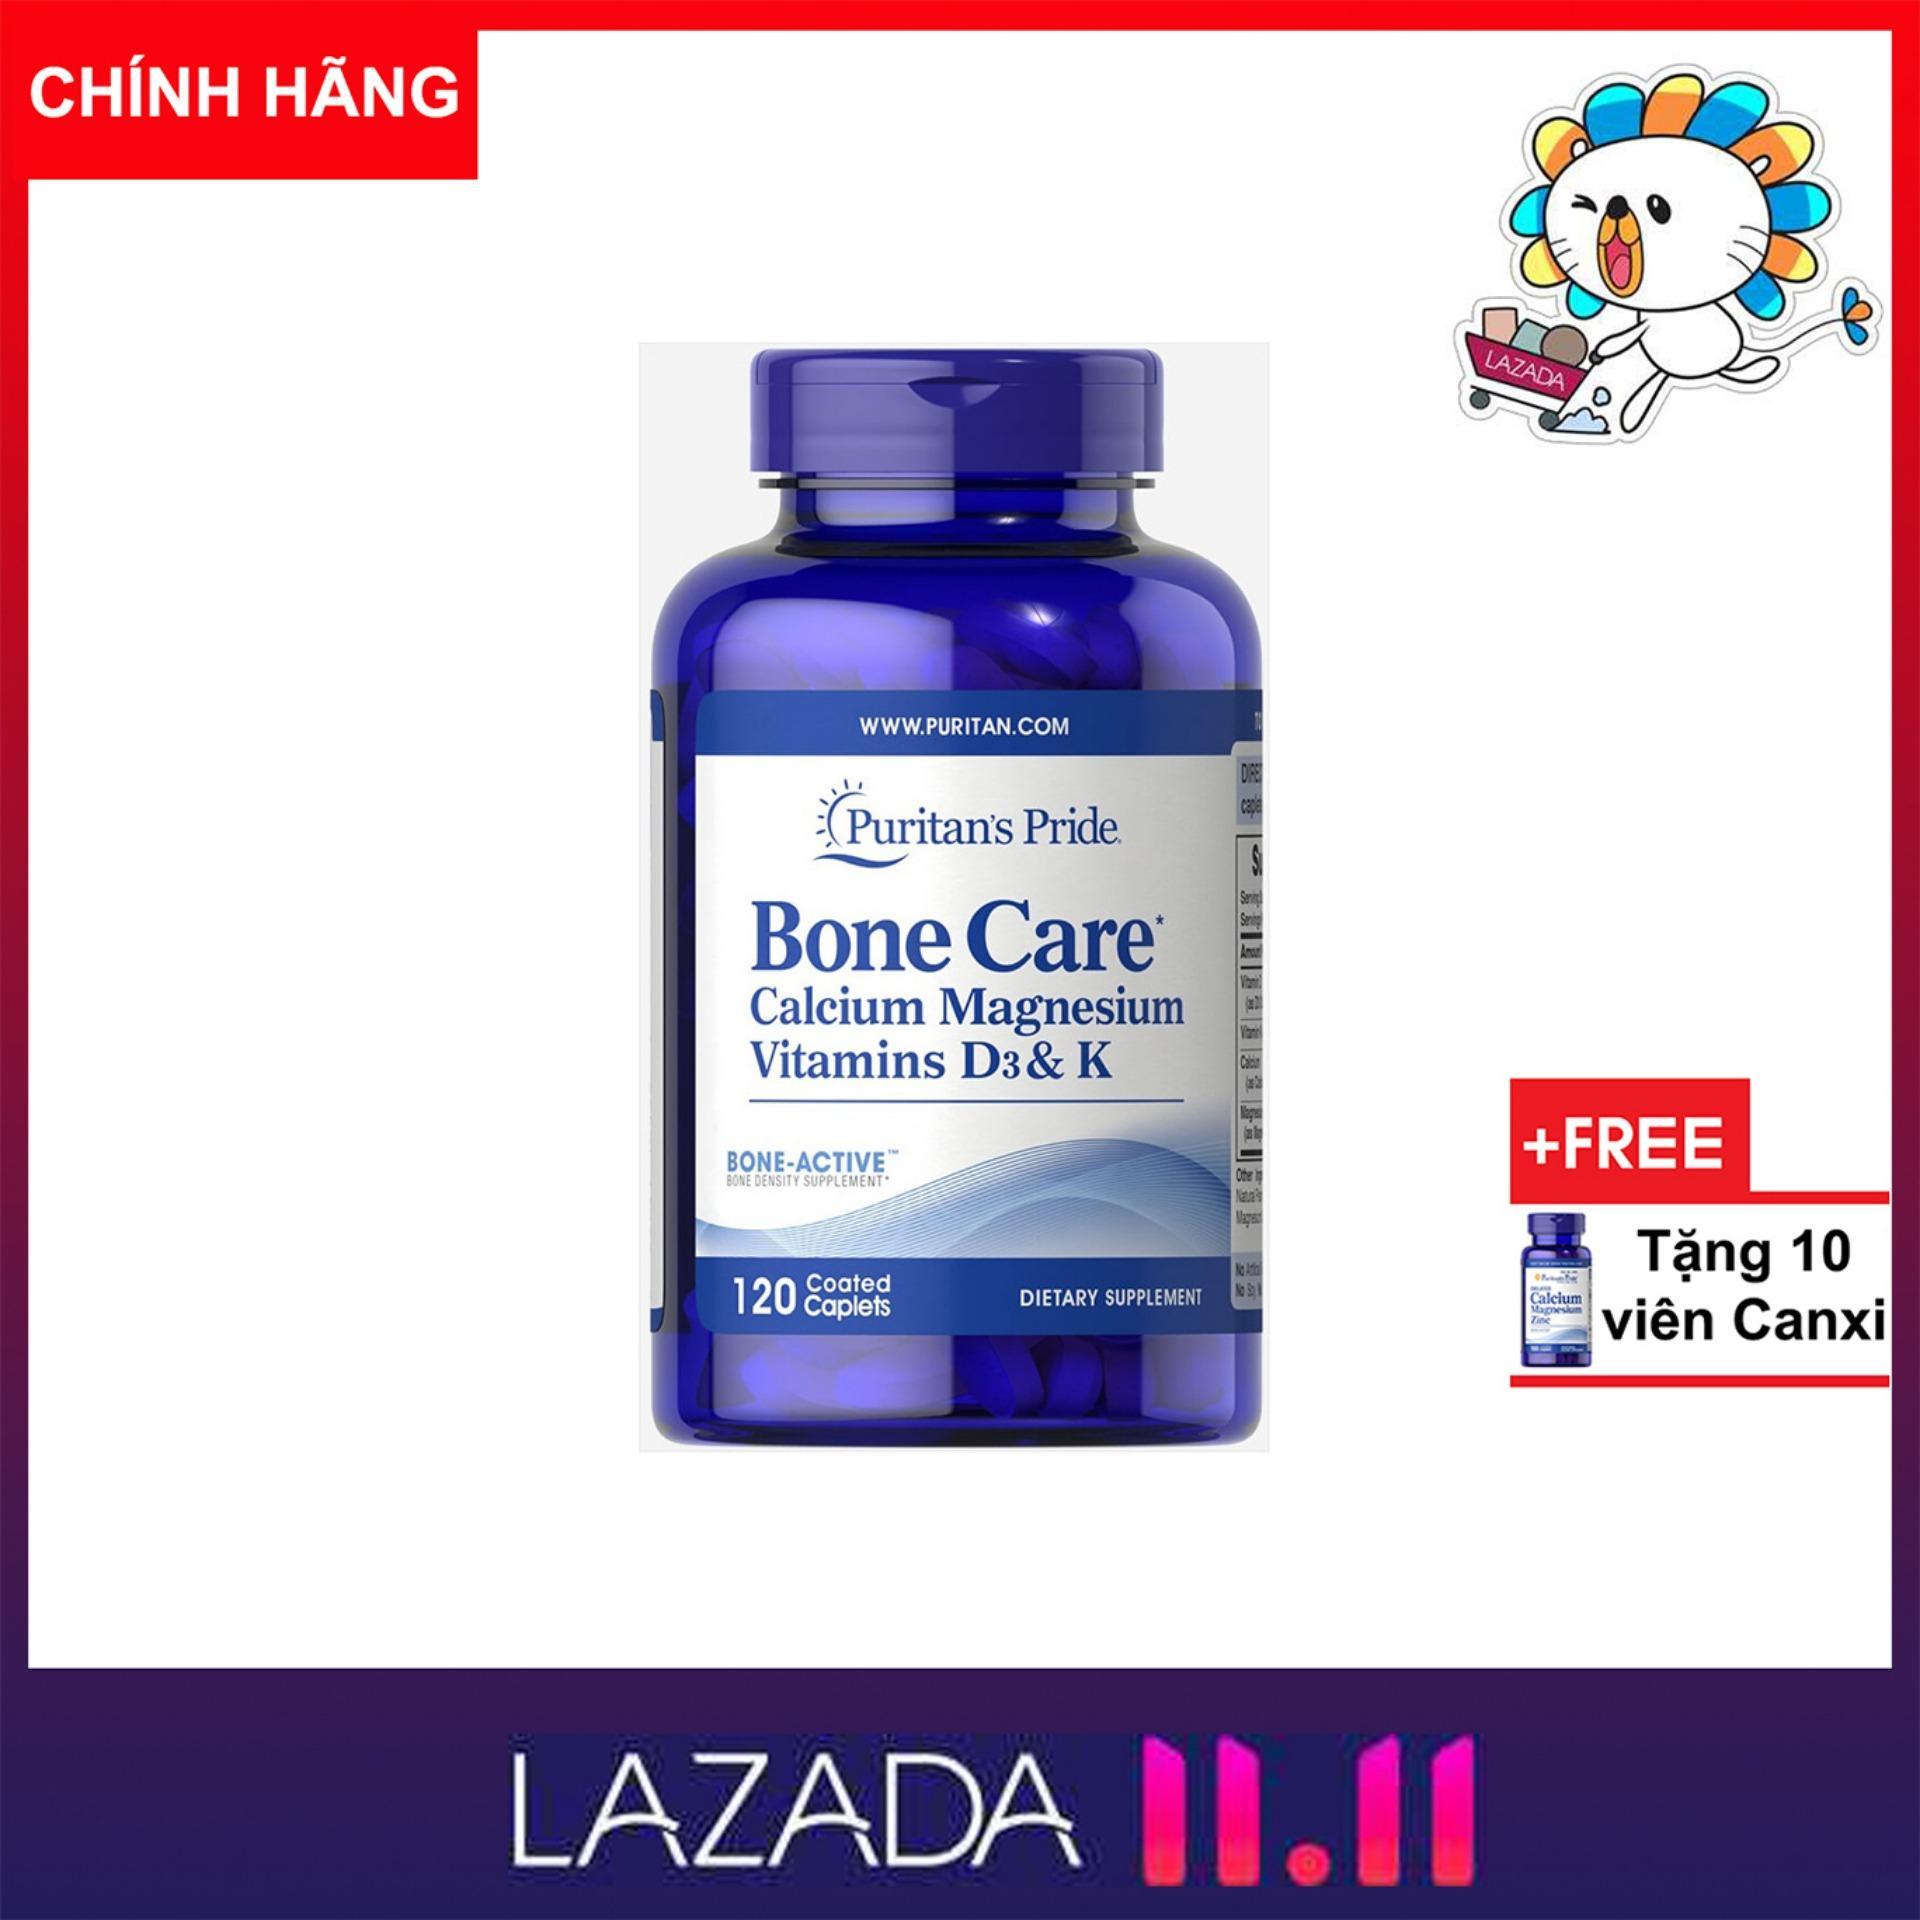 Mua Vitamin Tng Hp Puritans Pride Online Gi Tt Calcium Magnesium Citrate Plus D 100 Capsules Vin Ung B Sung Canxi K Magie Gip Xng Chc Khe